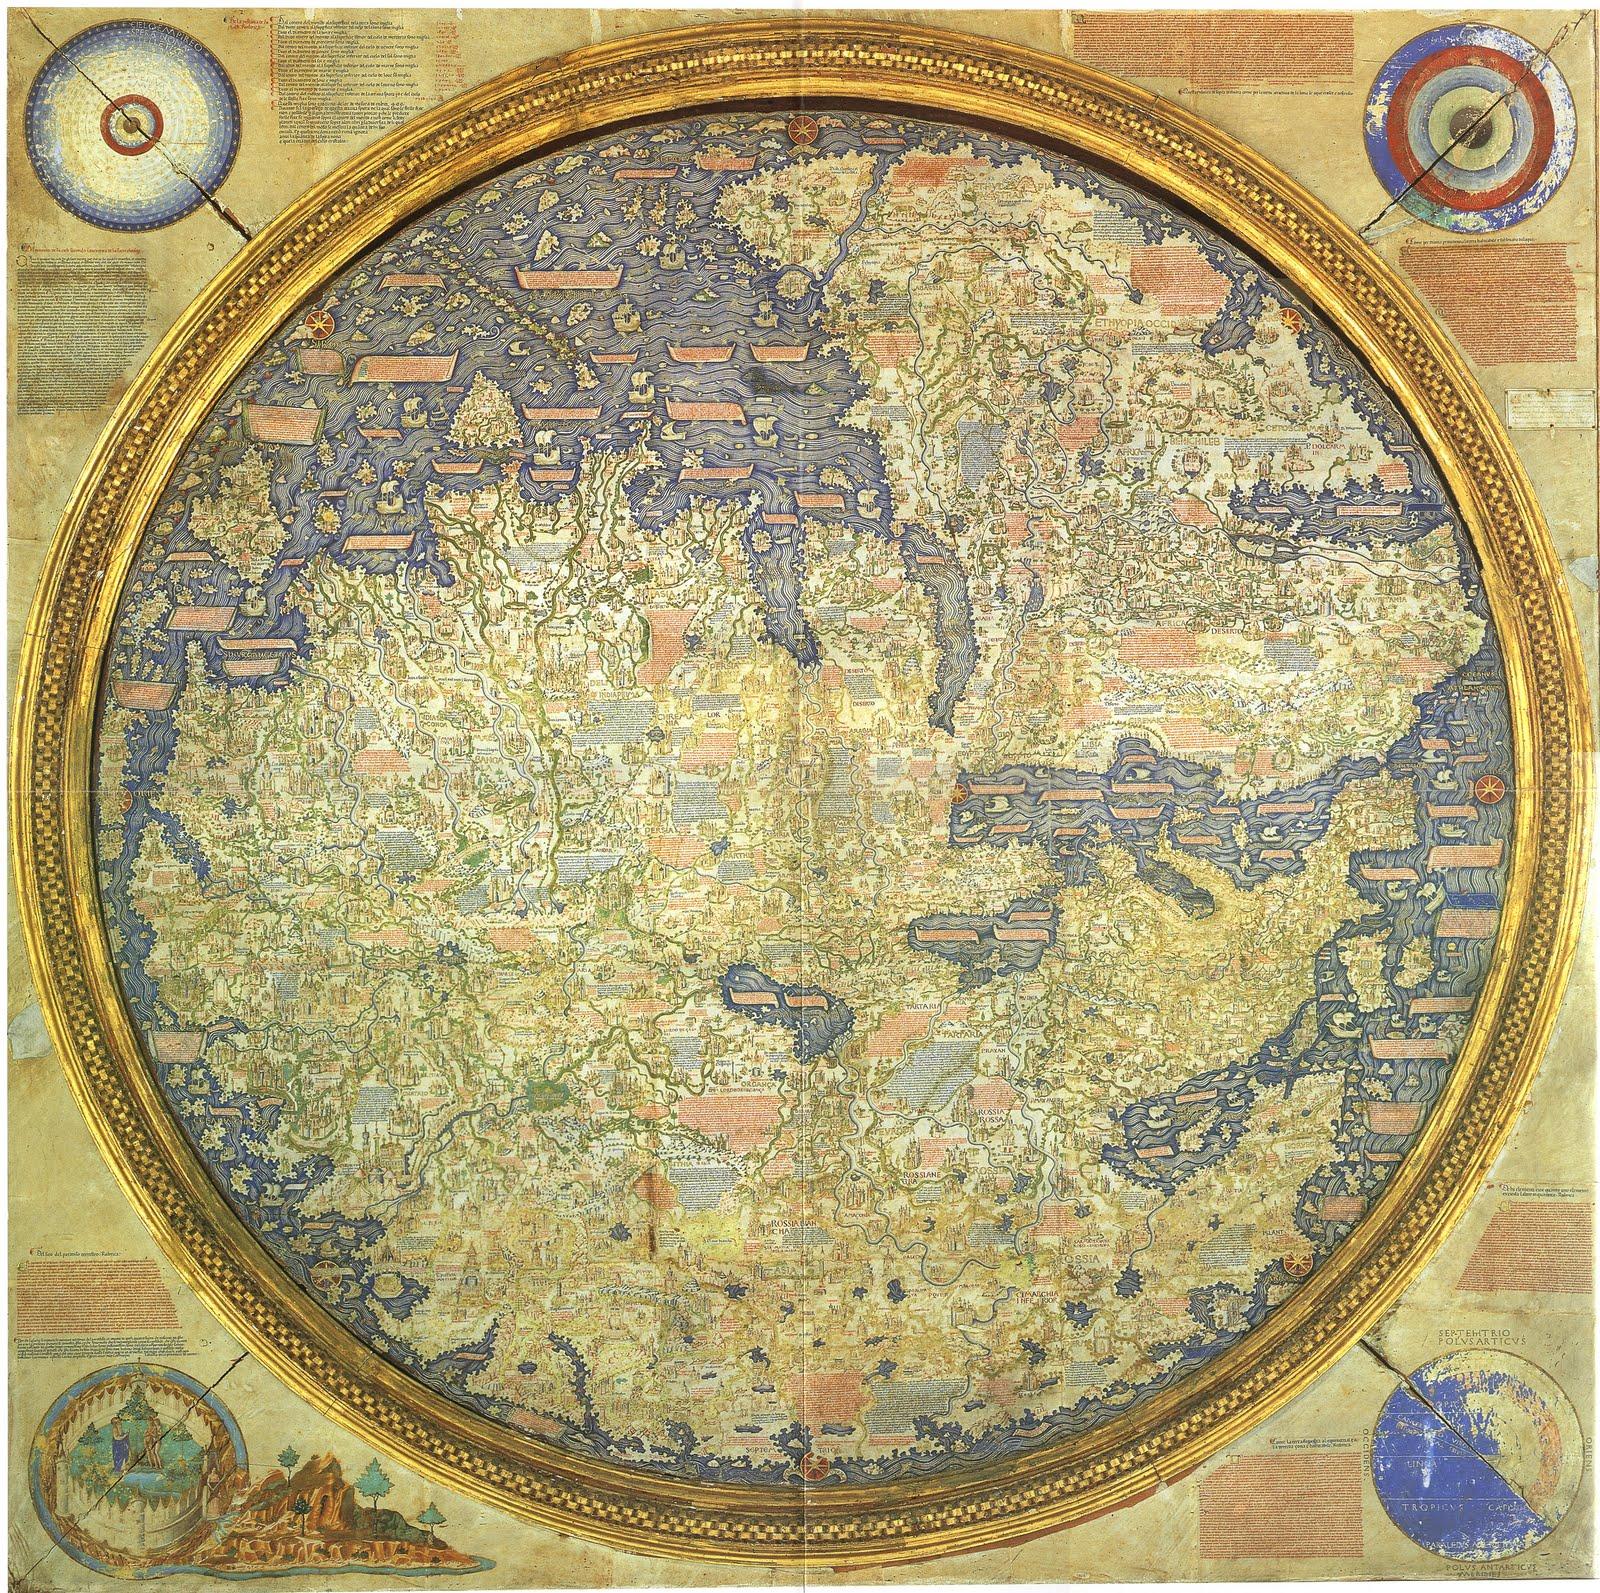 Ymago Mundi: Mapa-mundi De Fra Mauro (alta Definição